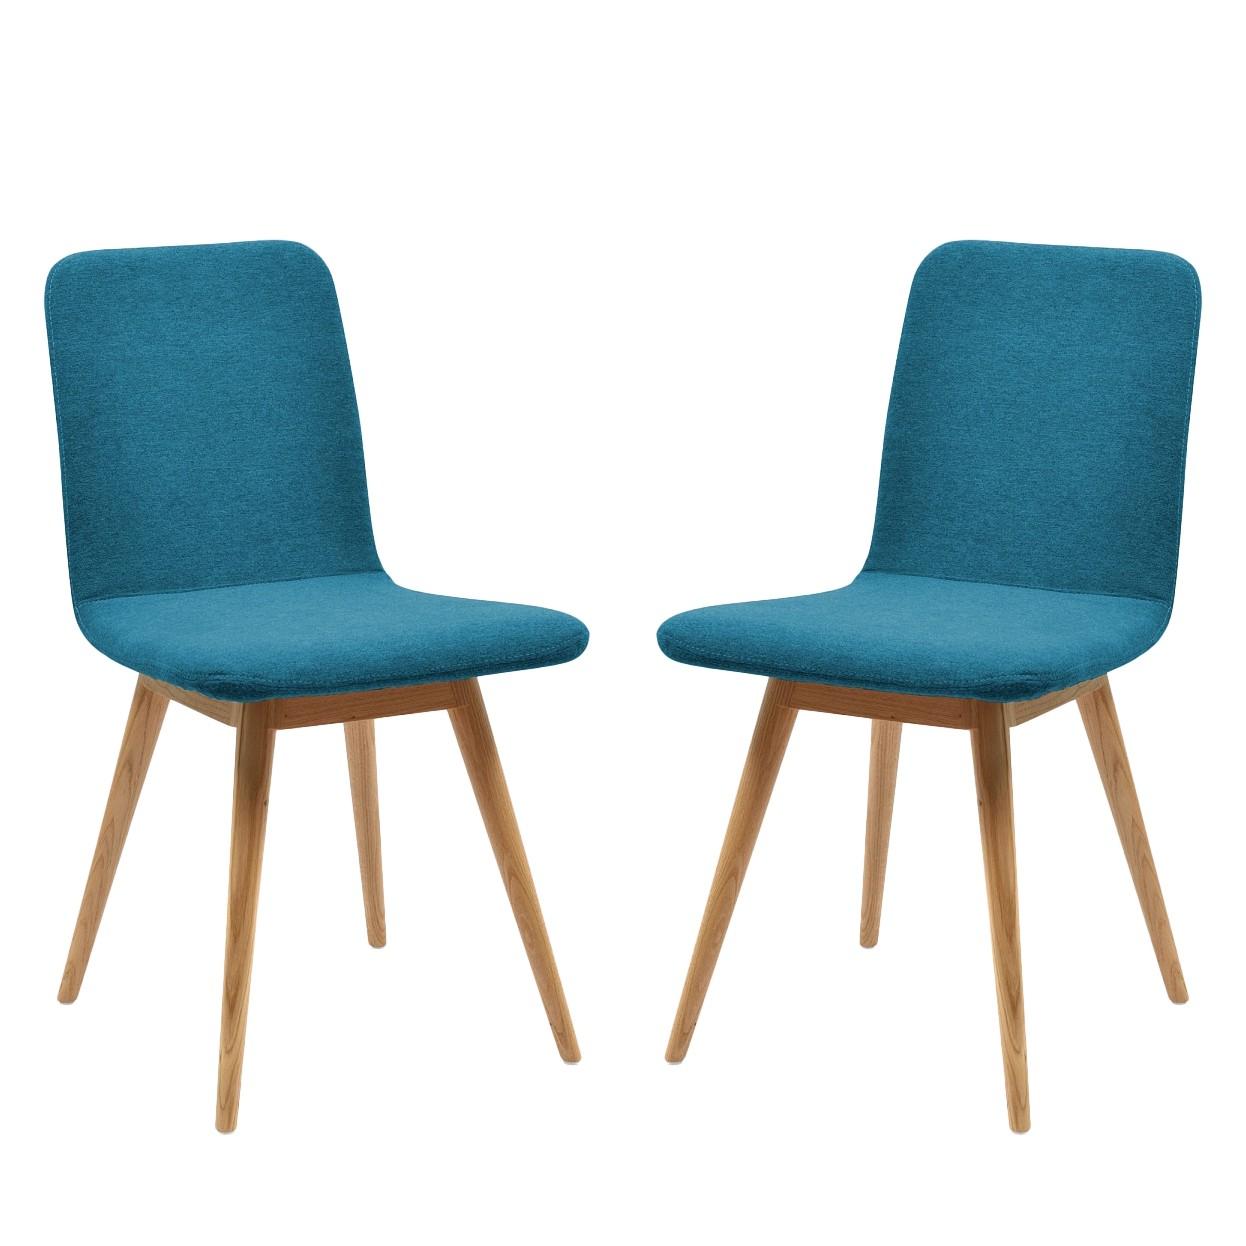 Gestoffeerde stoelen Loca (2-delige set) - massief eikenhout - Stof Gaia Petrolblauw, Studio Copenhagen